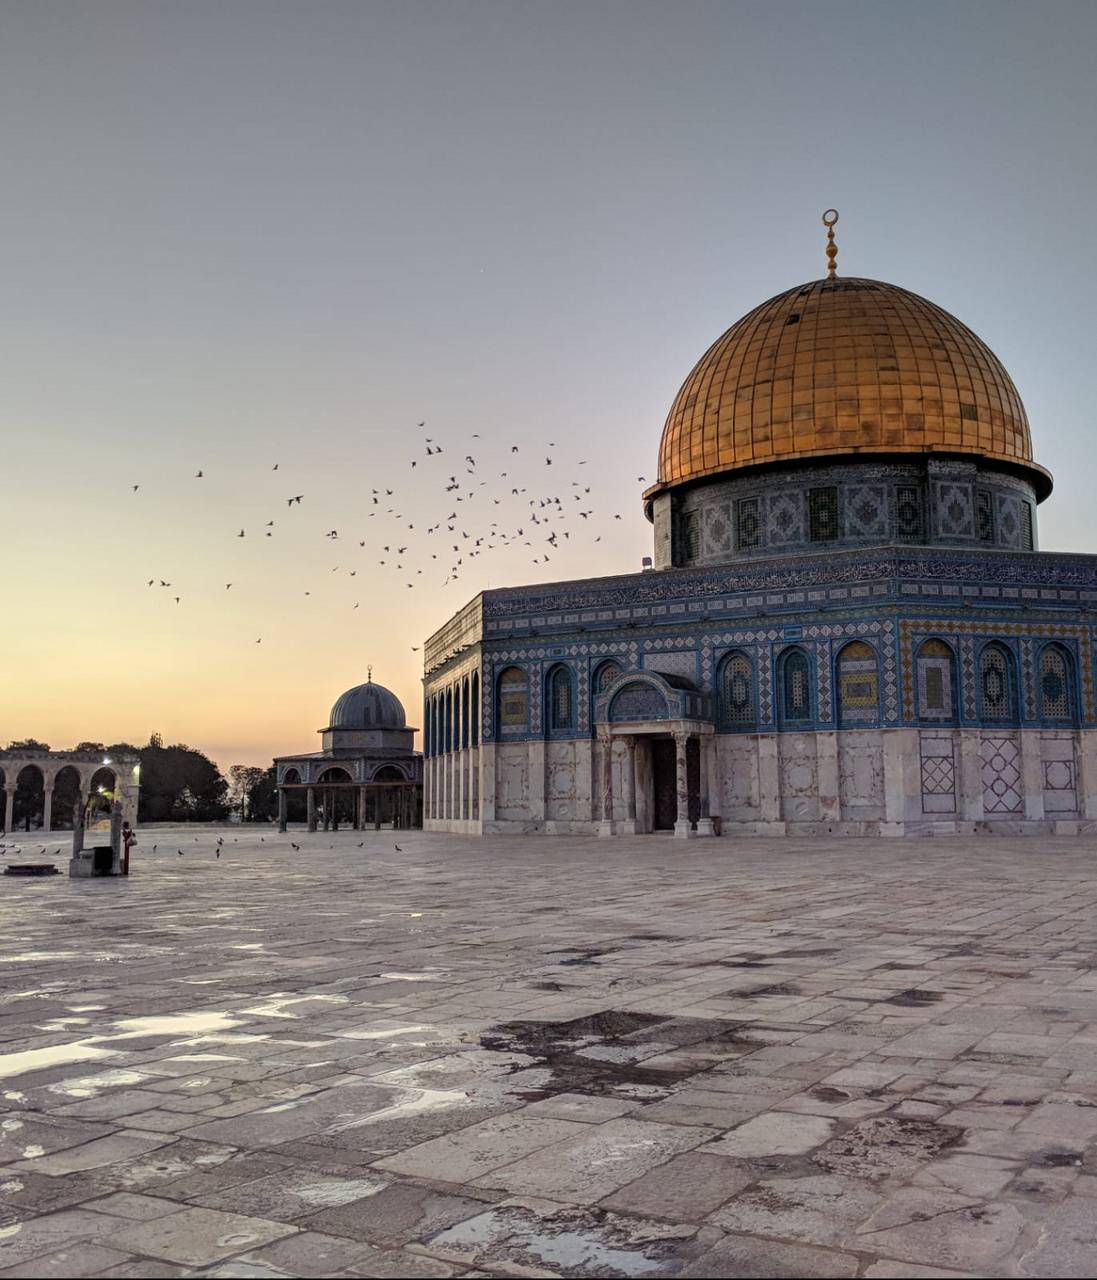 Masjid Al Aqsa Wallpaper By Landoftheblessed 1f Free On Zedge